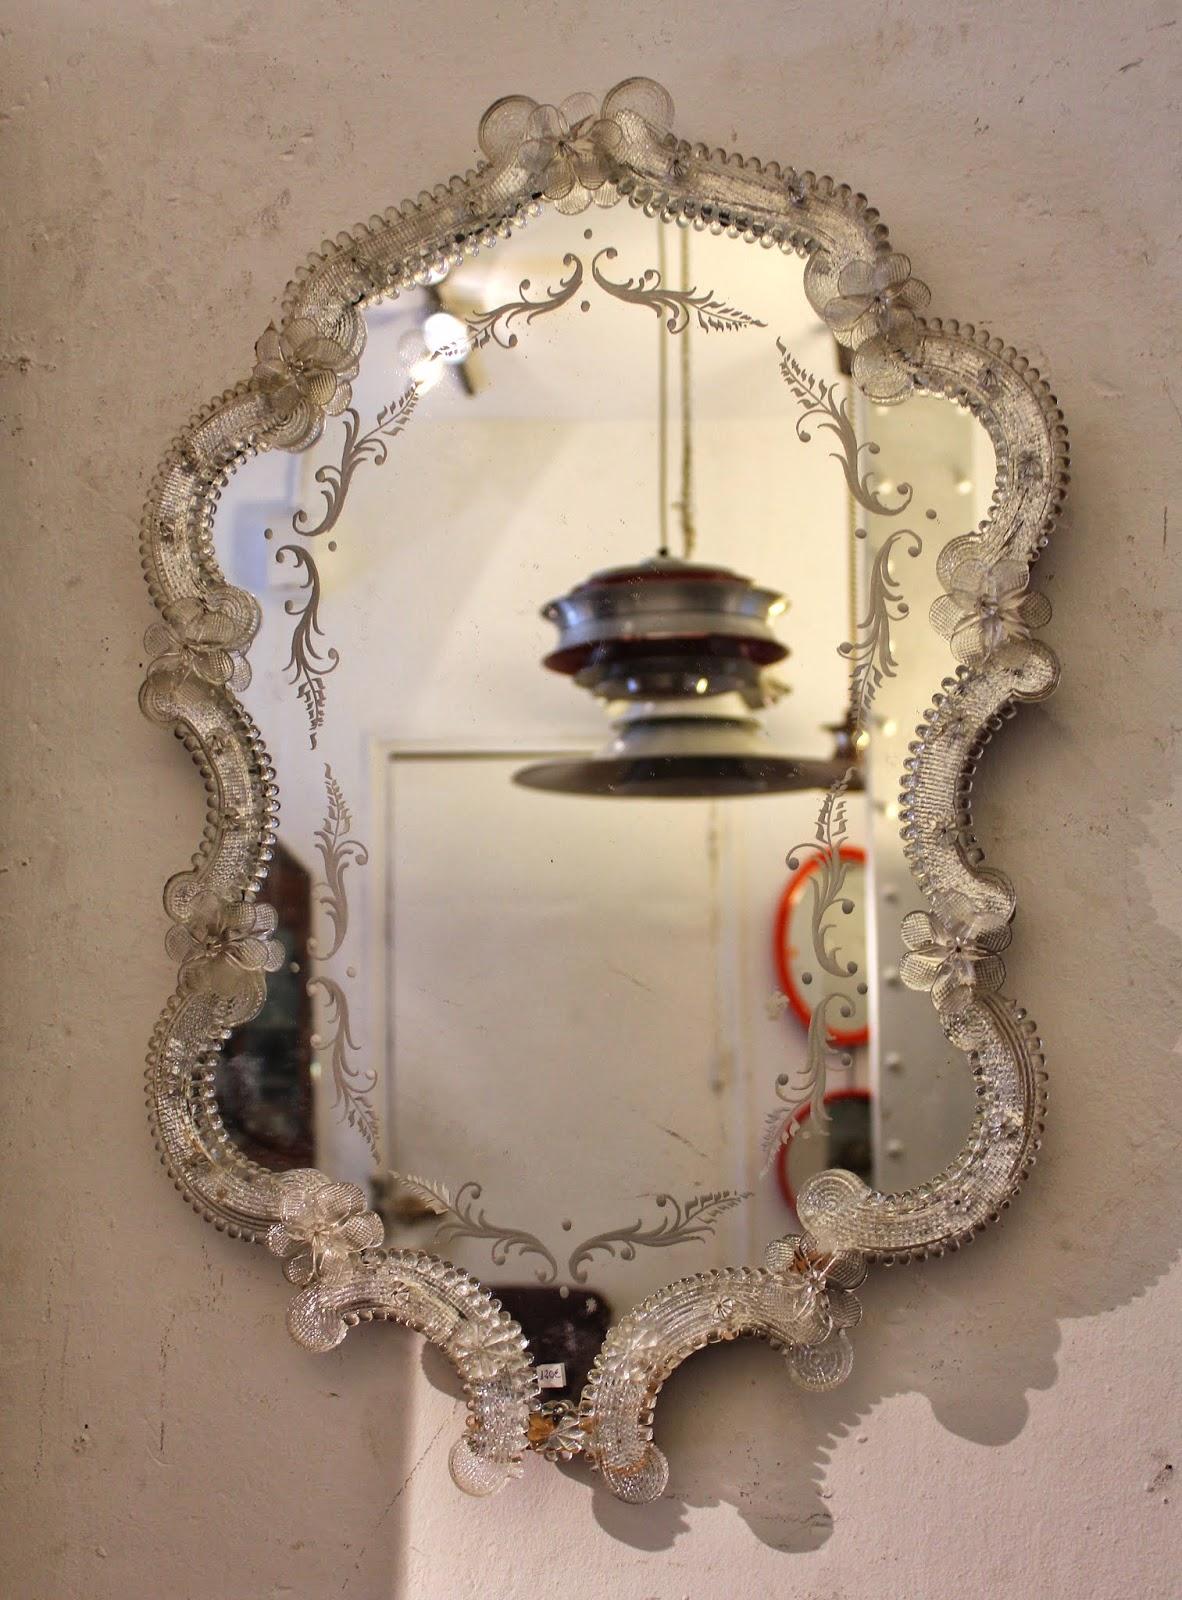 Design Espejos De Segunda Mano Las Mejores Ideas E  ~ Espejos Decorativos Segunda Mano